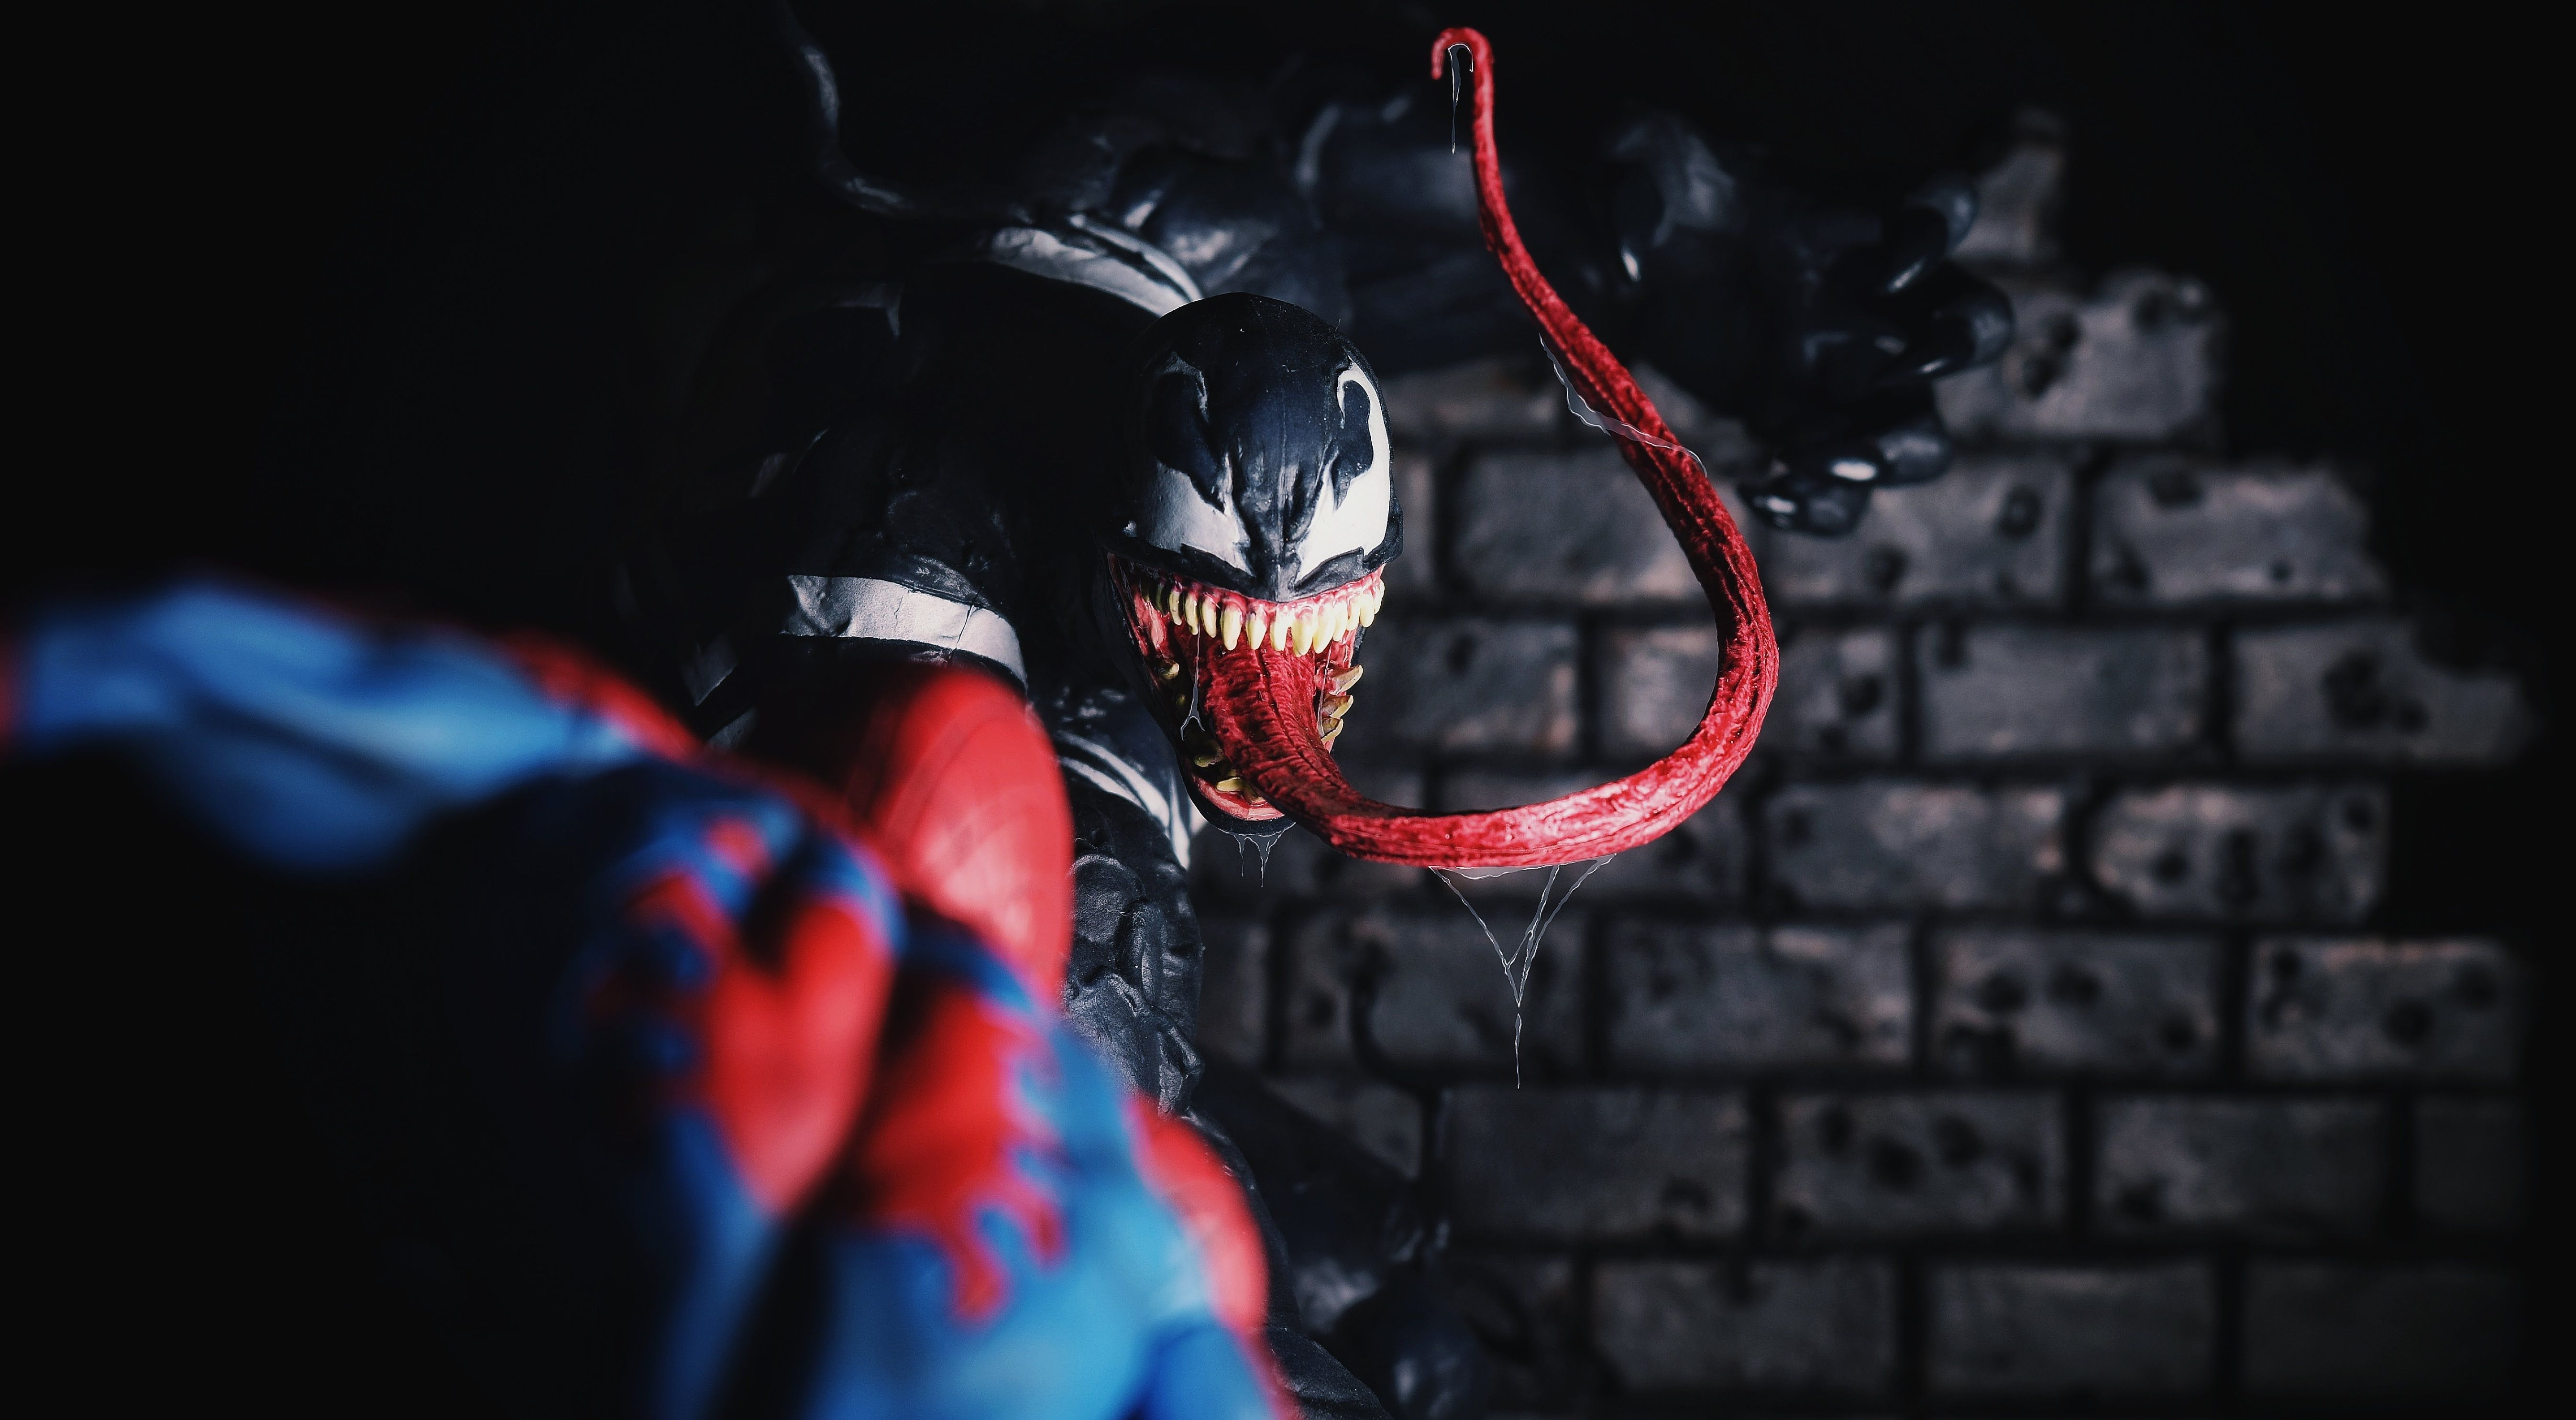 Kotobukiya Venom Spiderman Spiderman Art Spiderman Artwork 3d Wallpaper Spiderman